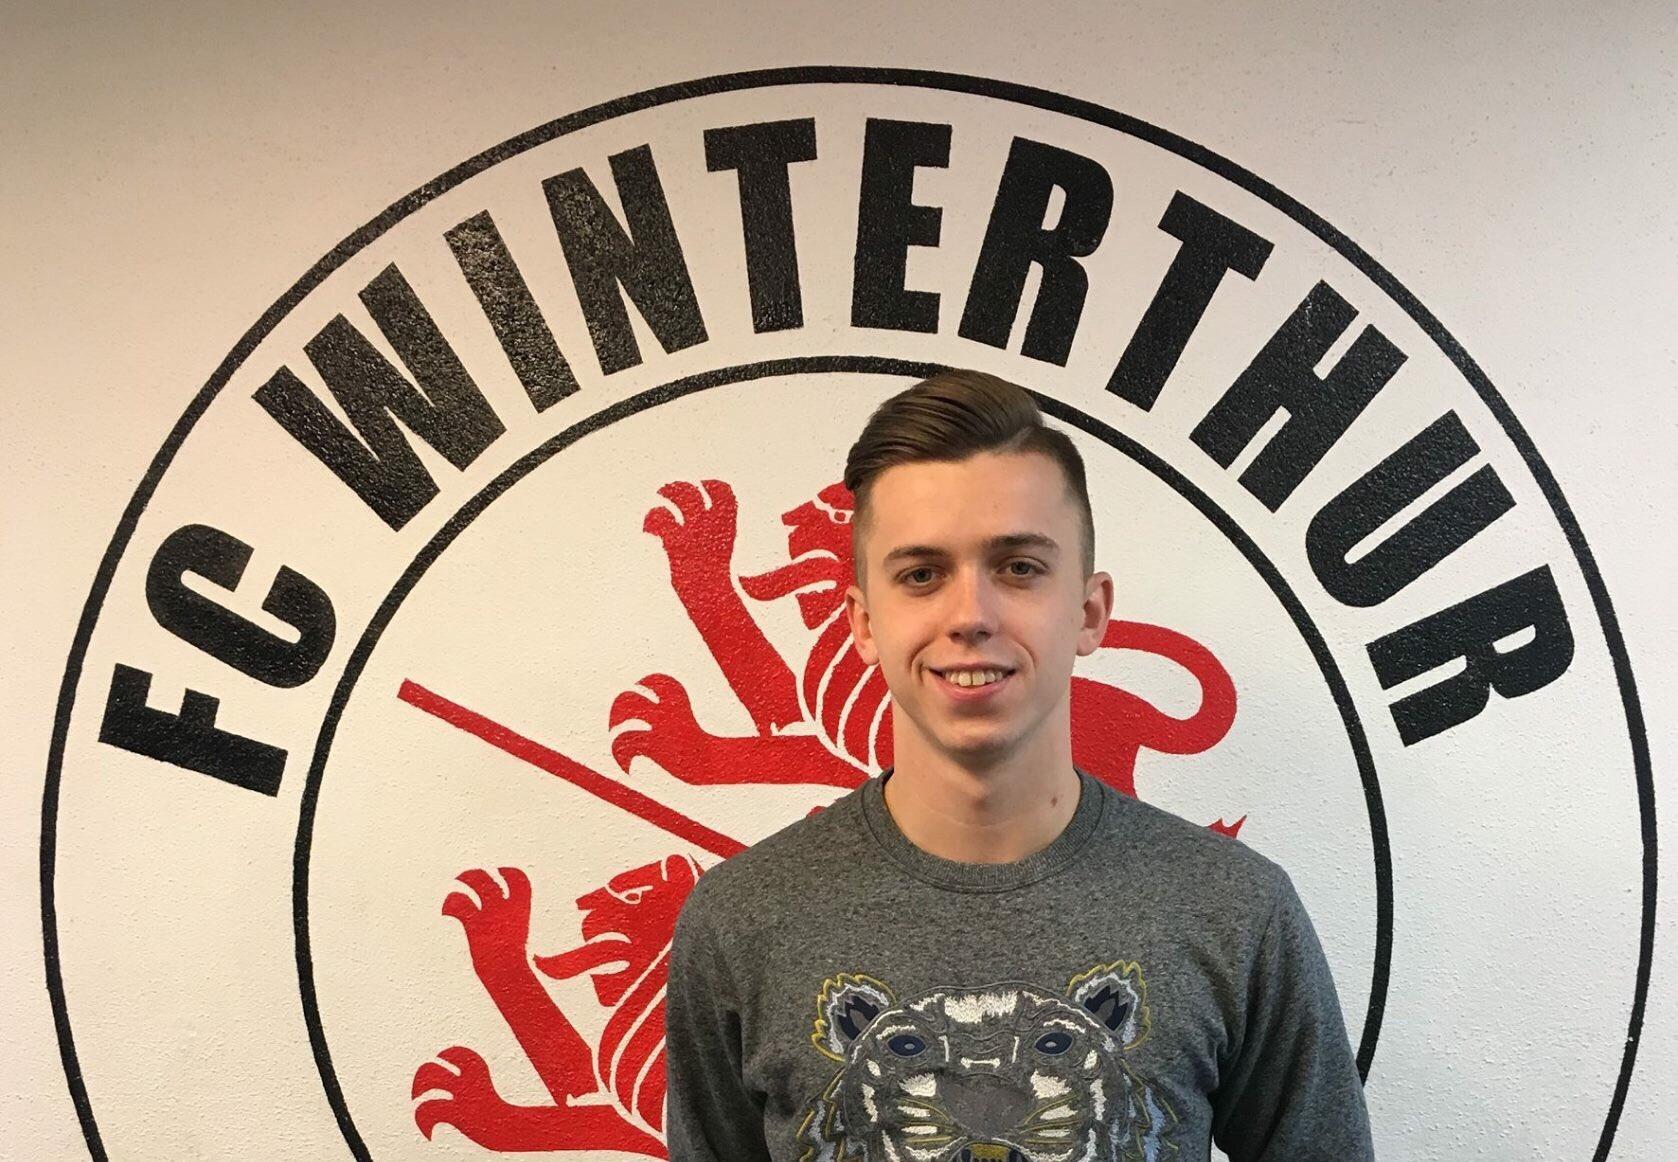 Nikola Milosavljevic prêté au FC Winterthur jusqu'en juin 2019 | Milosavljevic an Winterthur ausgeliehen https://t.co/HHinGNUvlG